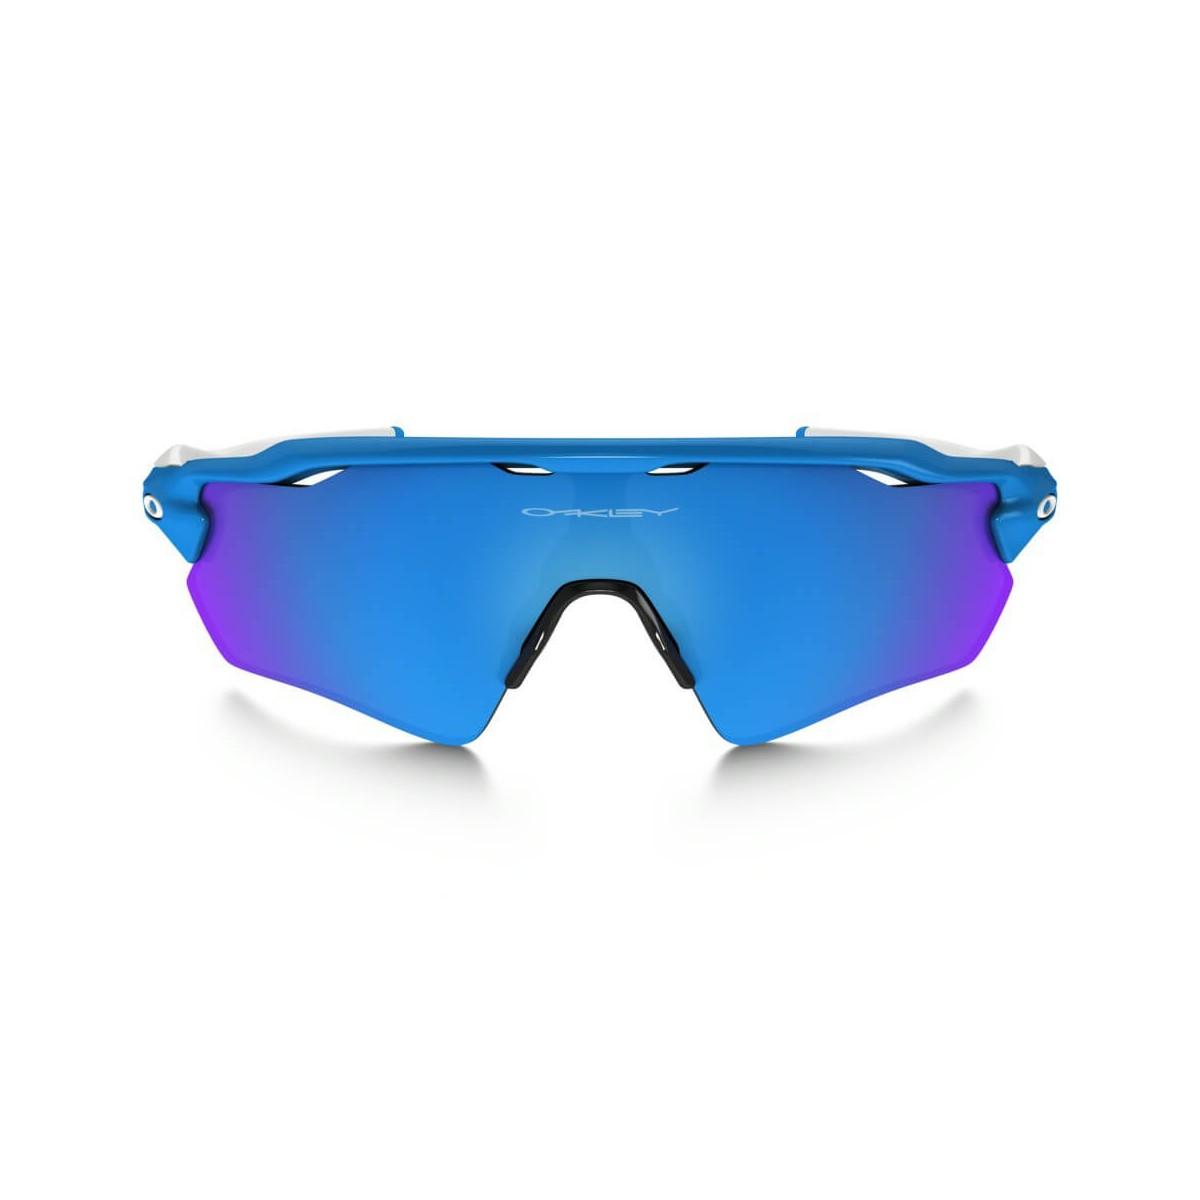 f918a22ee0 Gafas Running Oakley Radar EV Path AzulSky/Iridio Zafiro